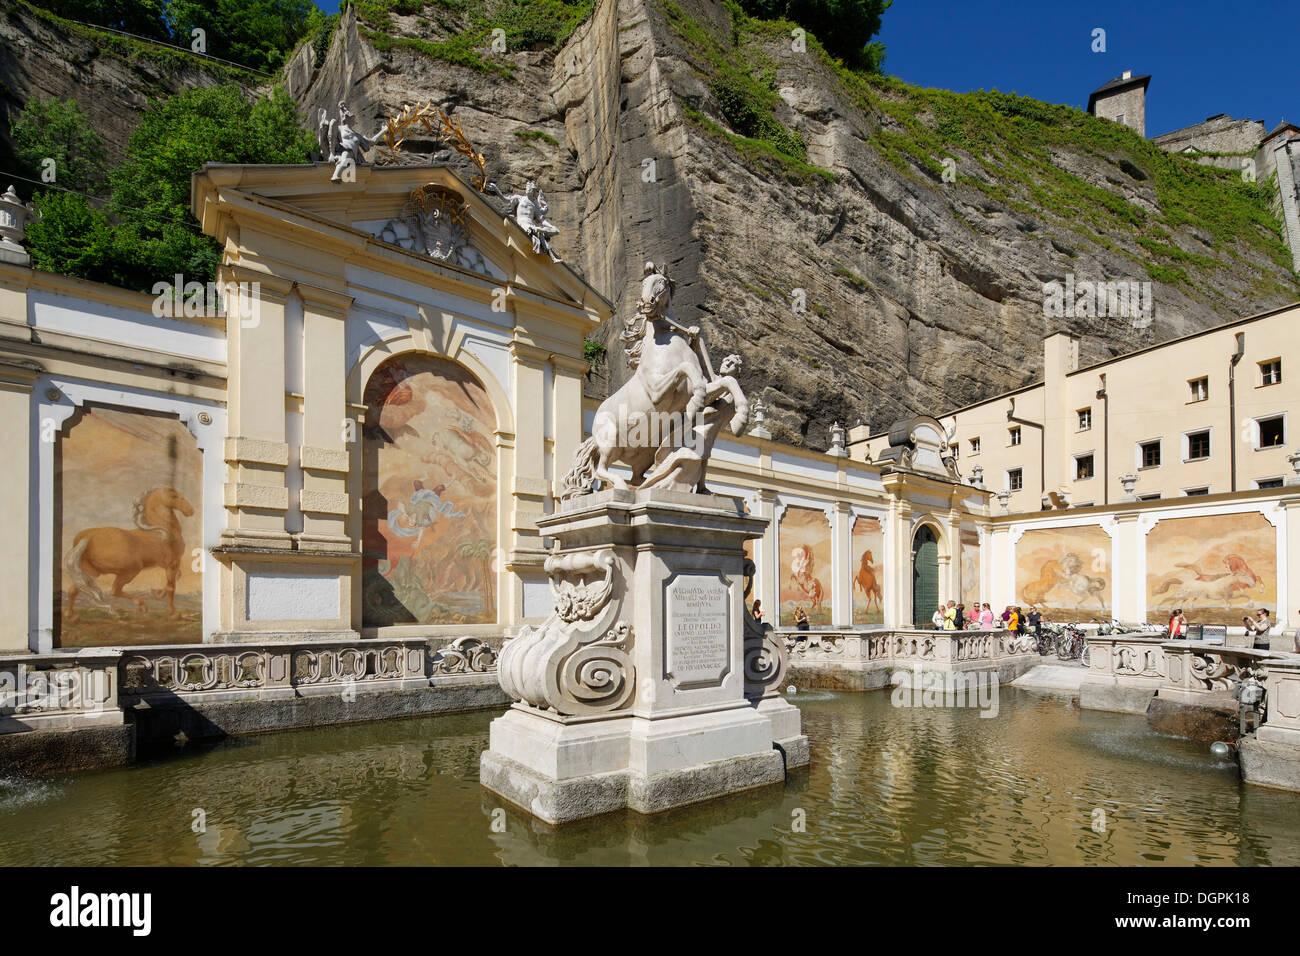 Stables with a horse tamer statue by Bernhard Michael Mandl, Pferdeschwemme Baroque fountain, historic center, Salzburg - Stock Image